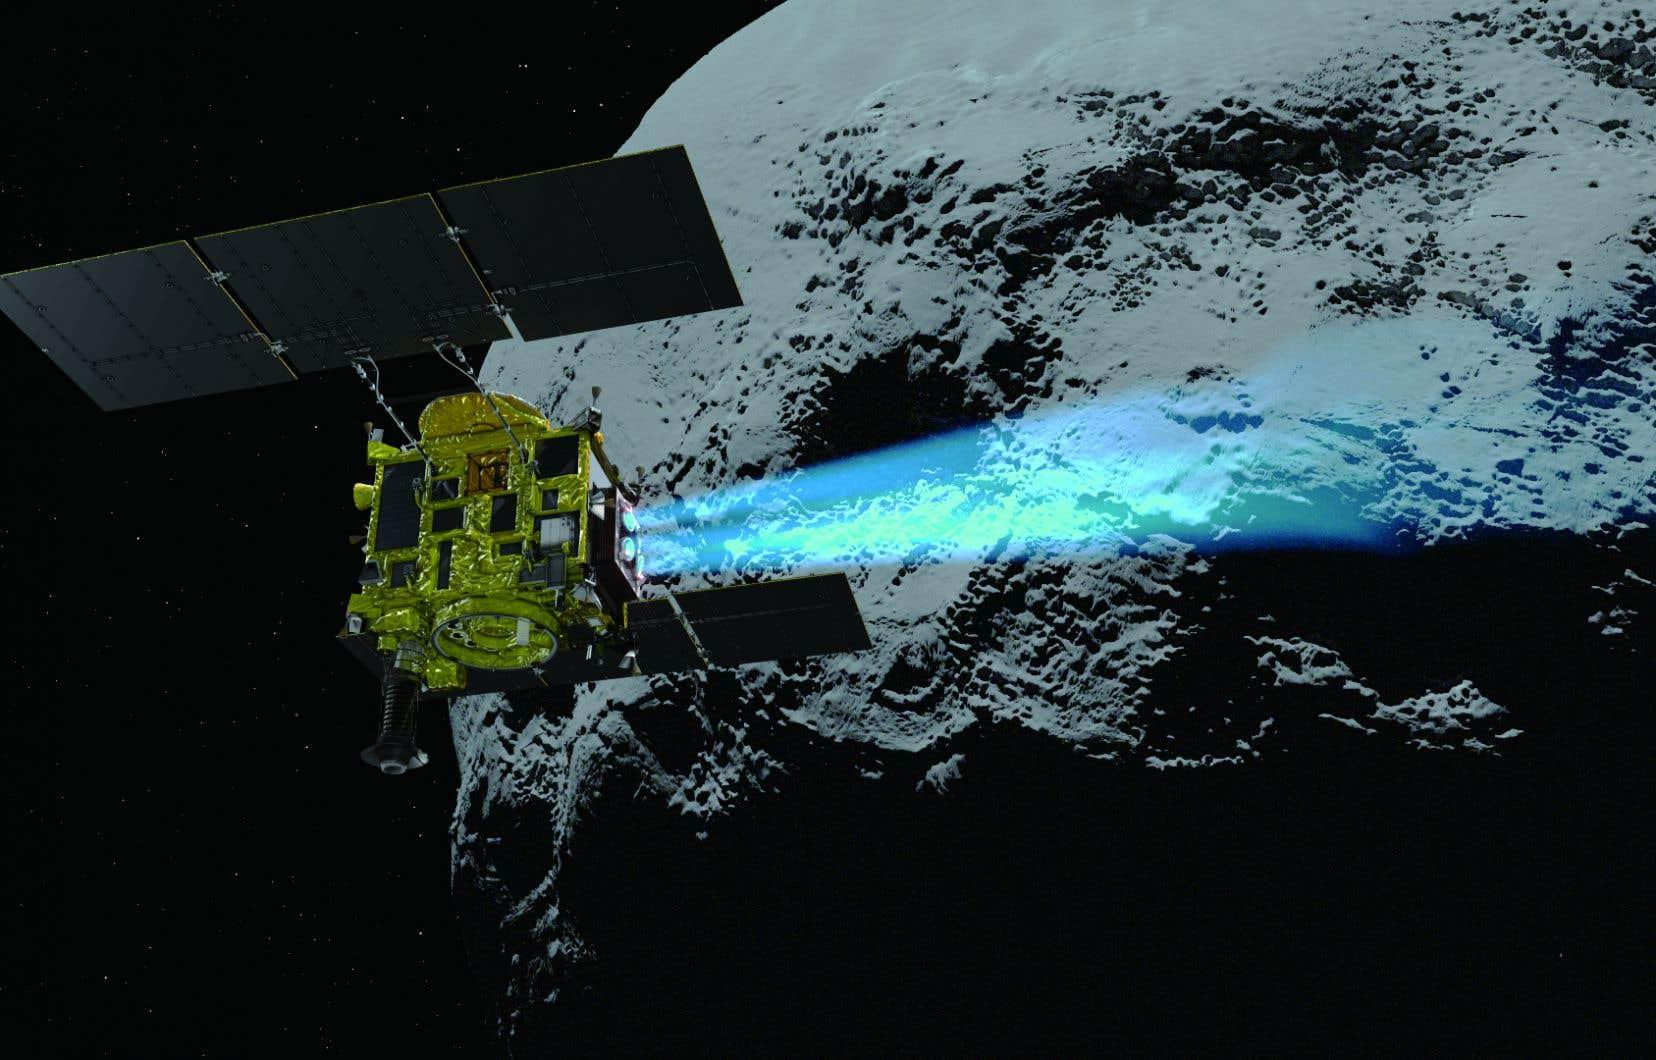 Vue d'artiste de la sonde <em>Hayabusa2</em> et de l'astéroïde Ryugu